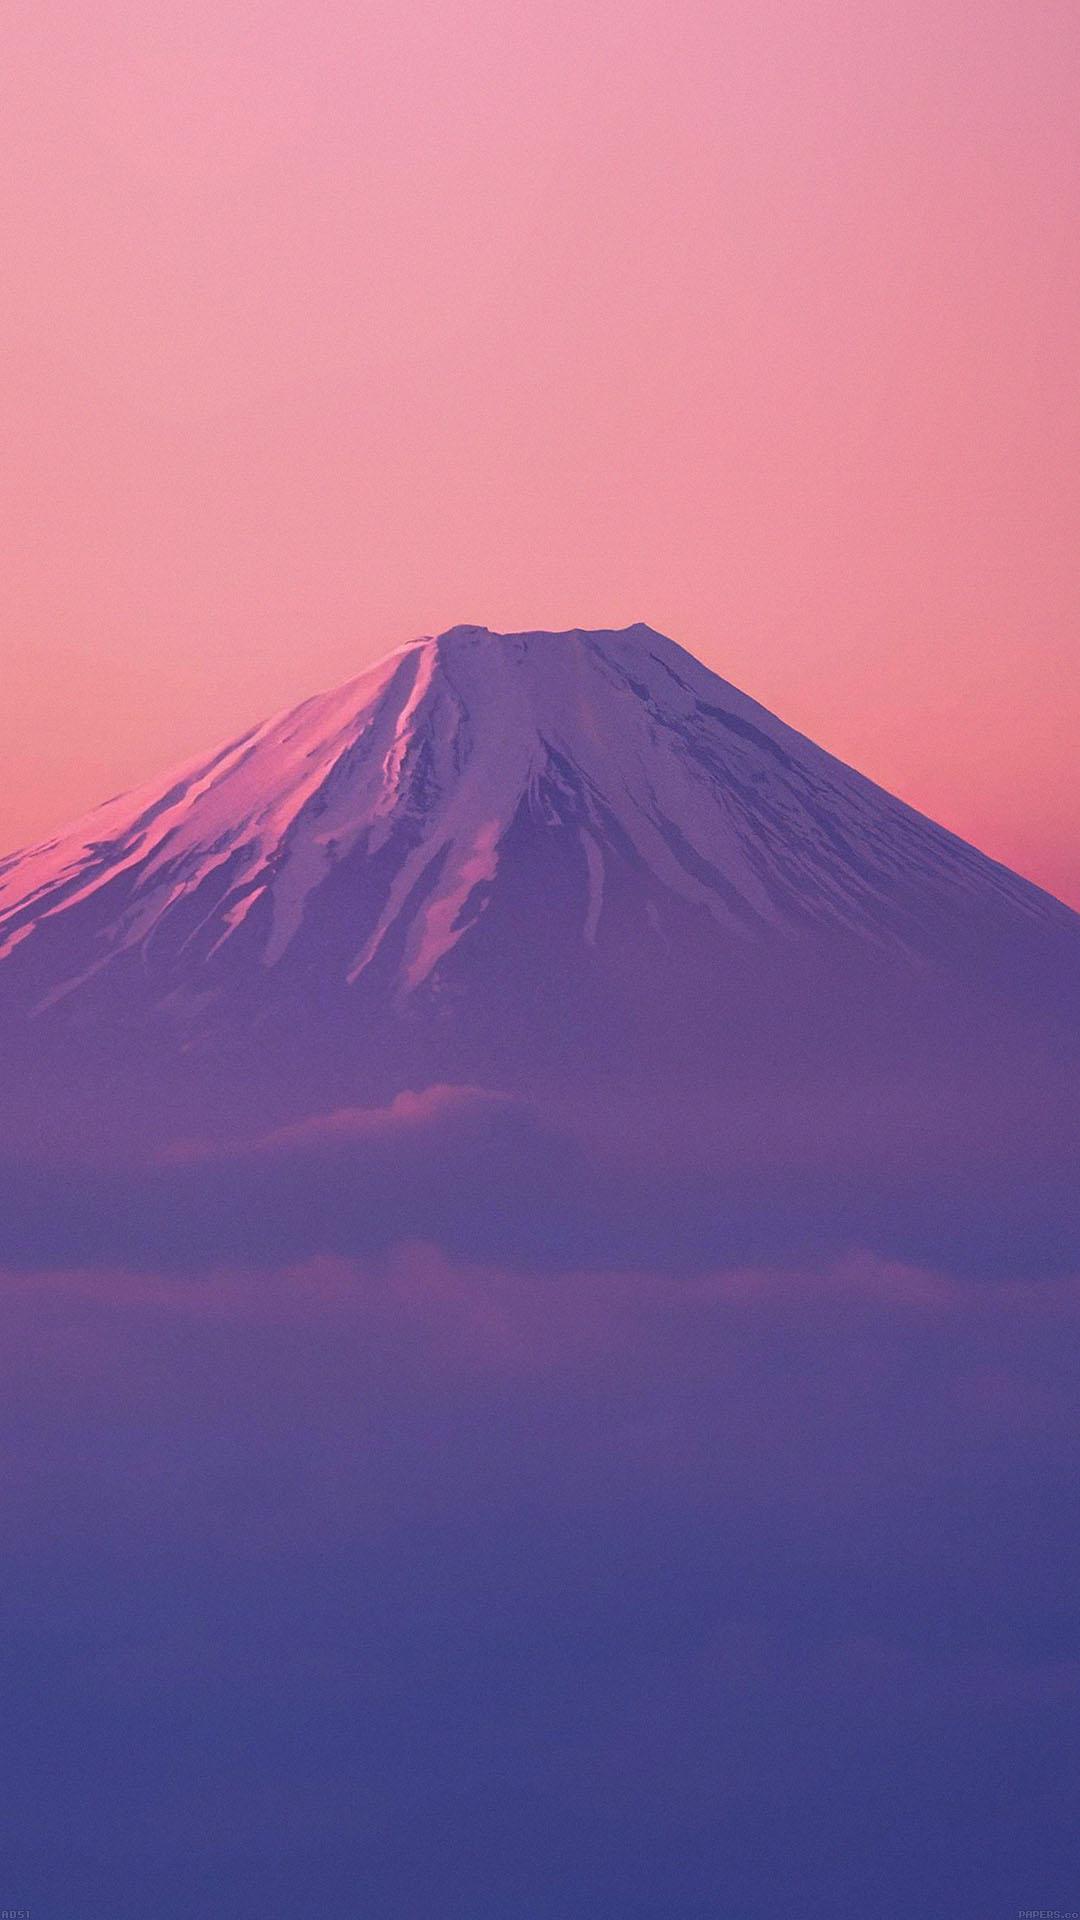 Cute Pink Wallpaper For Iphone 6 Plus Ad51 Fuji Mountain Alone Wallpaper